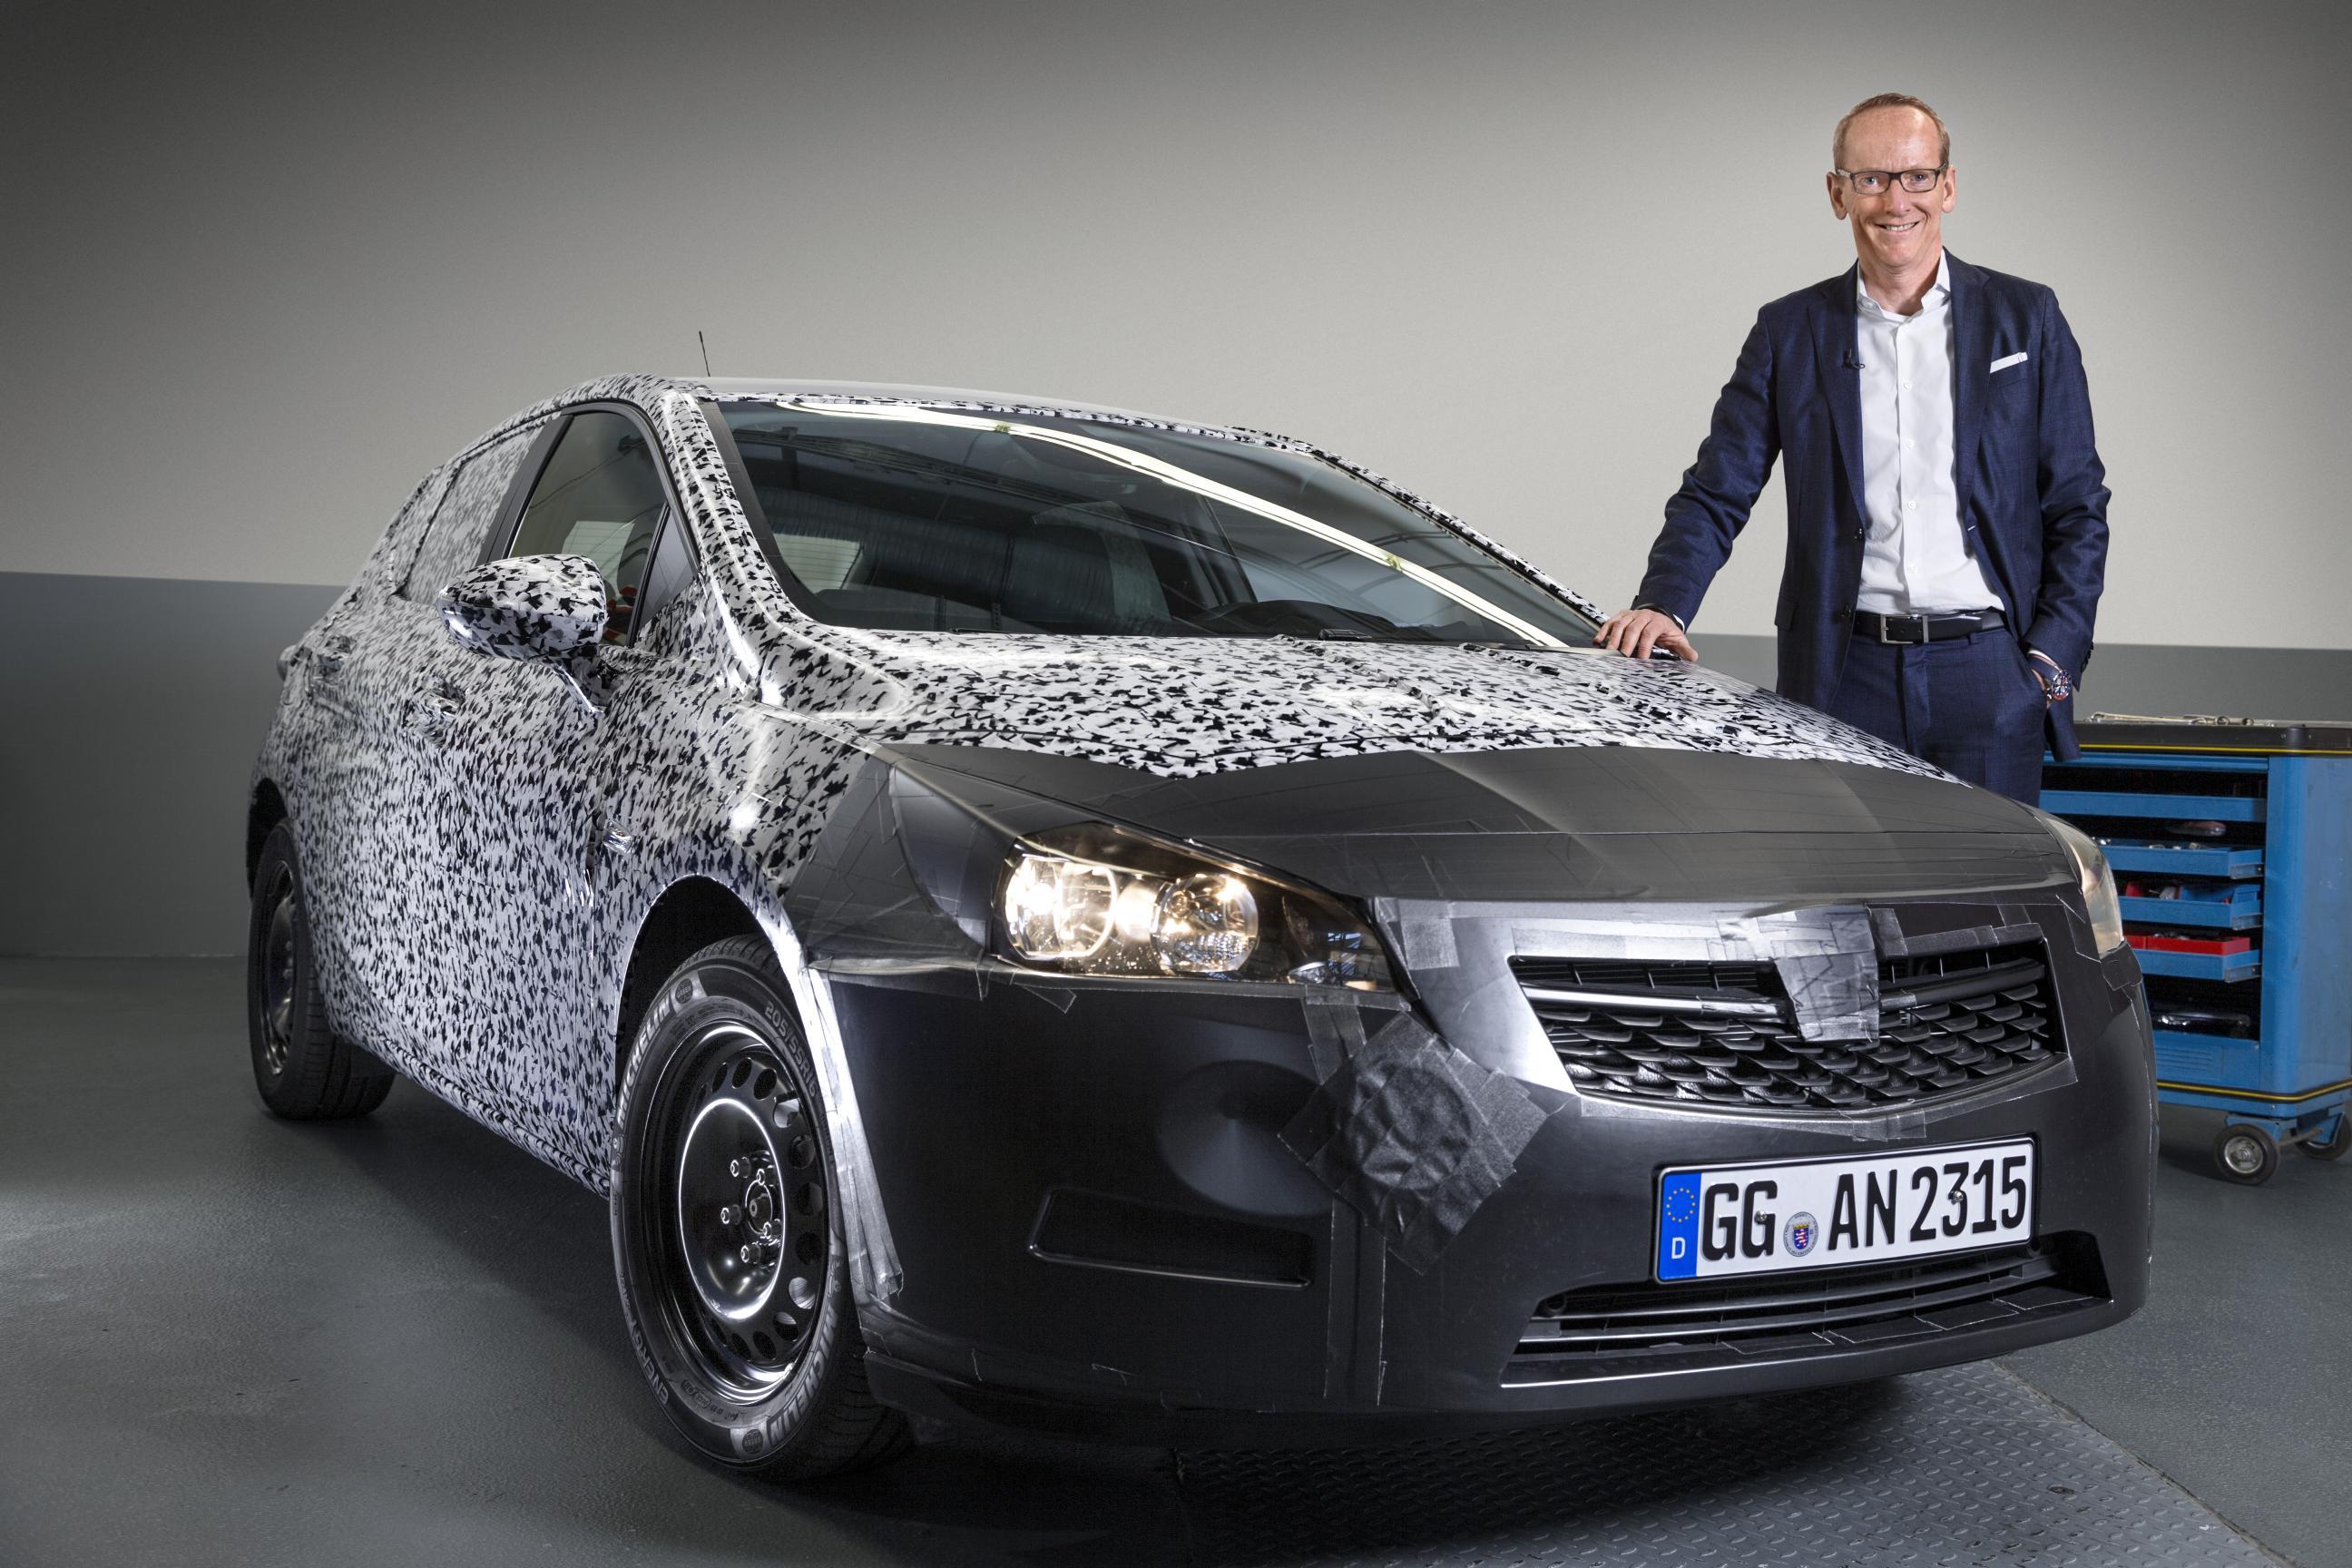 Anteprima: la nuova Opel Astra